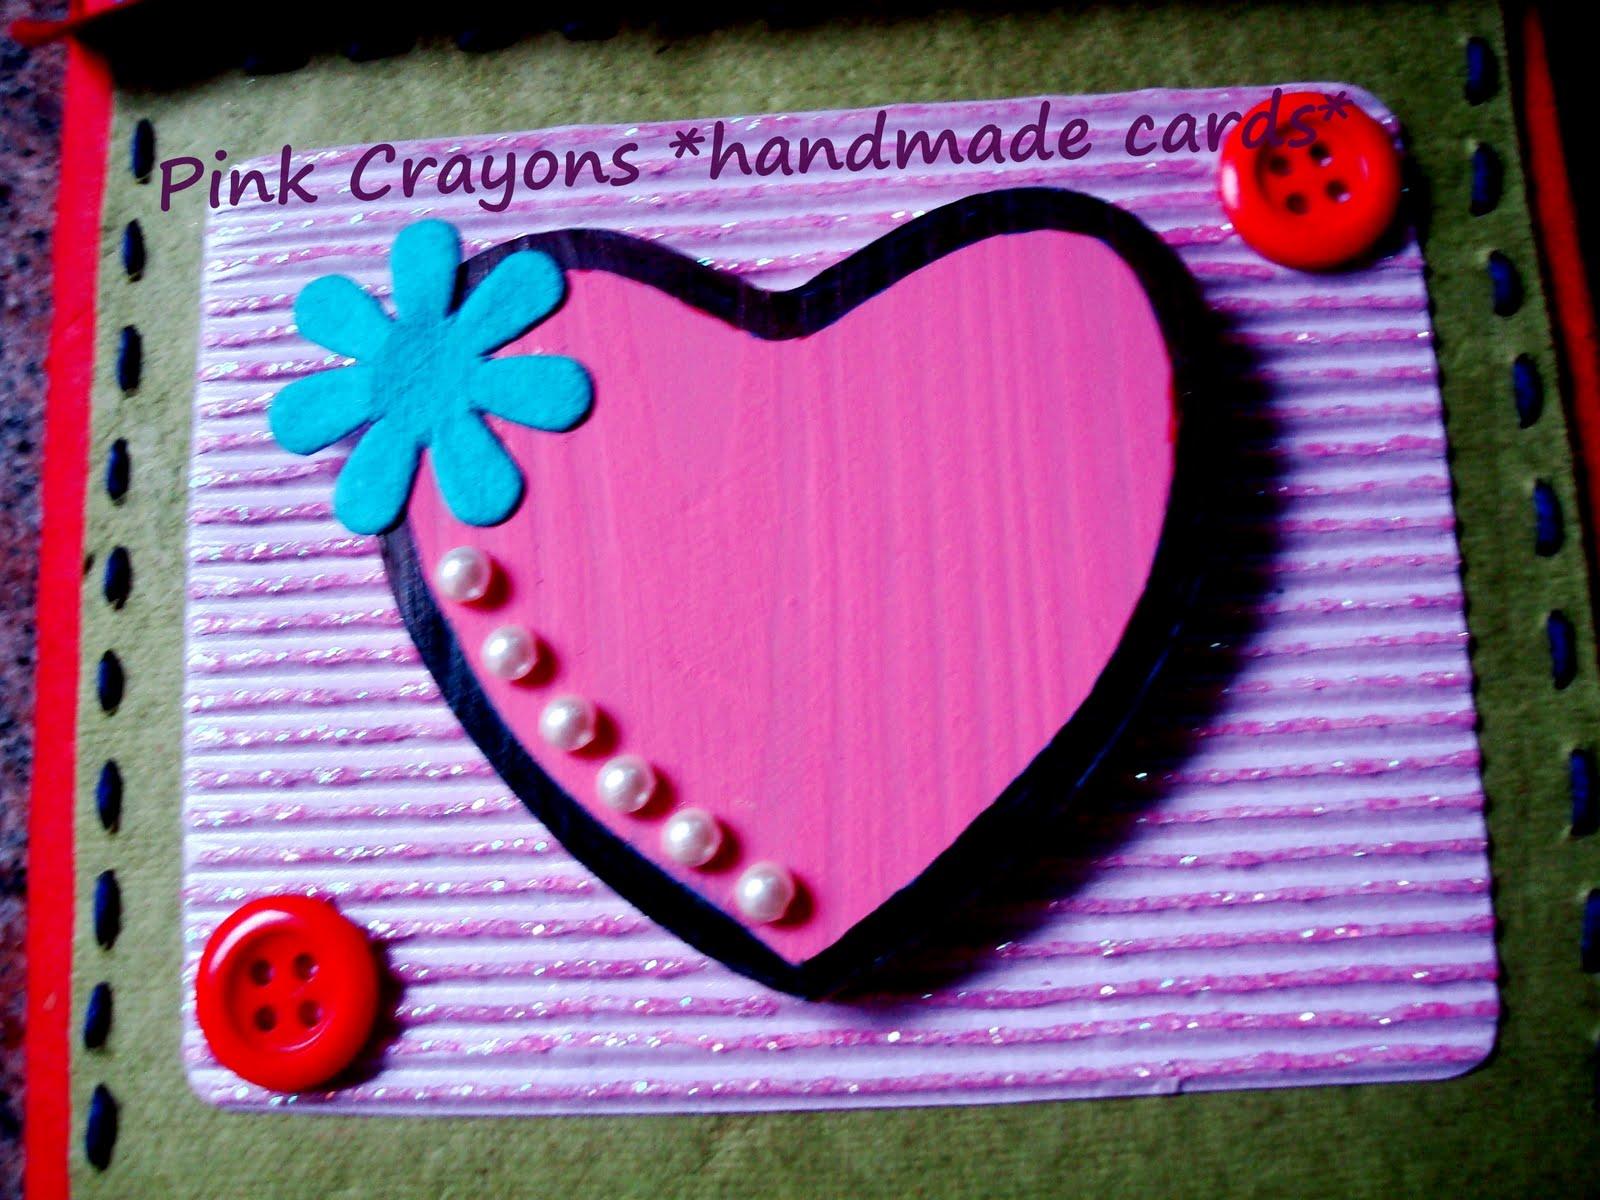 Pink crayon handmade cards anniversary card pink crayon handmade cards thecheapjerseys Images